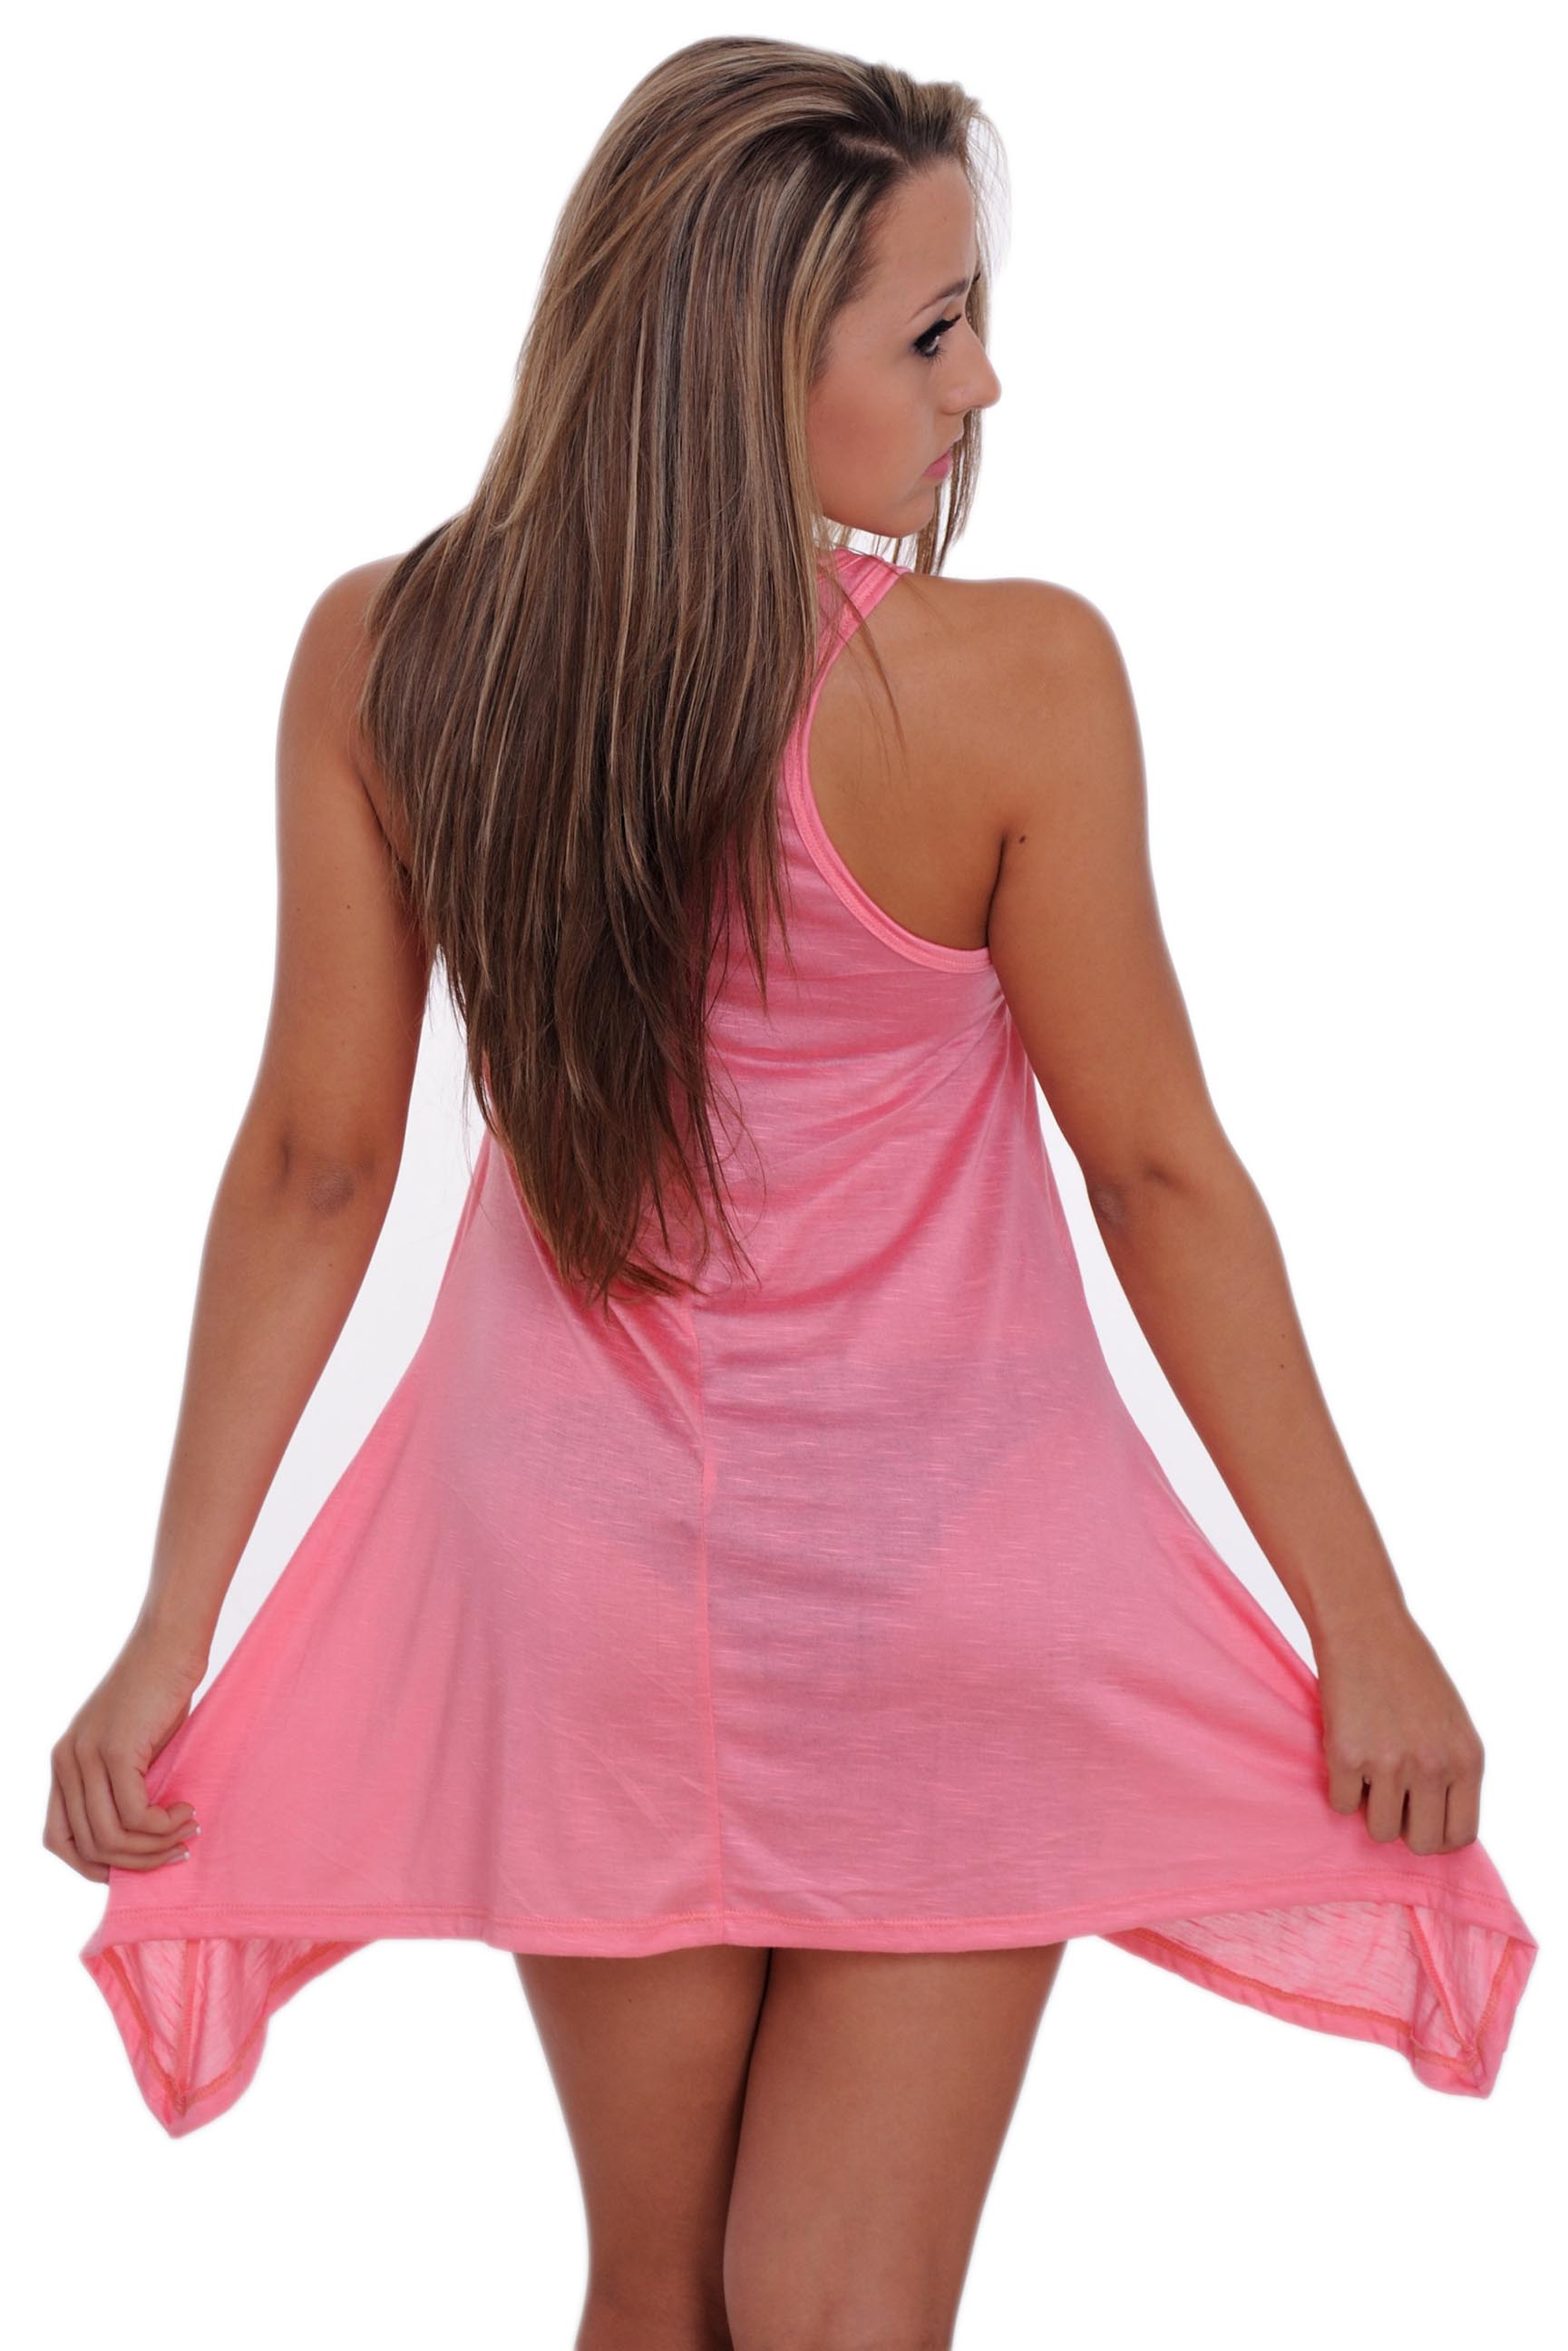 a2261b82e5 SHORE TRENDZ - Women s USA Flag Red White   Blue Flare Dress Swimwear Cover- up - Walmart.com